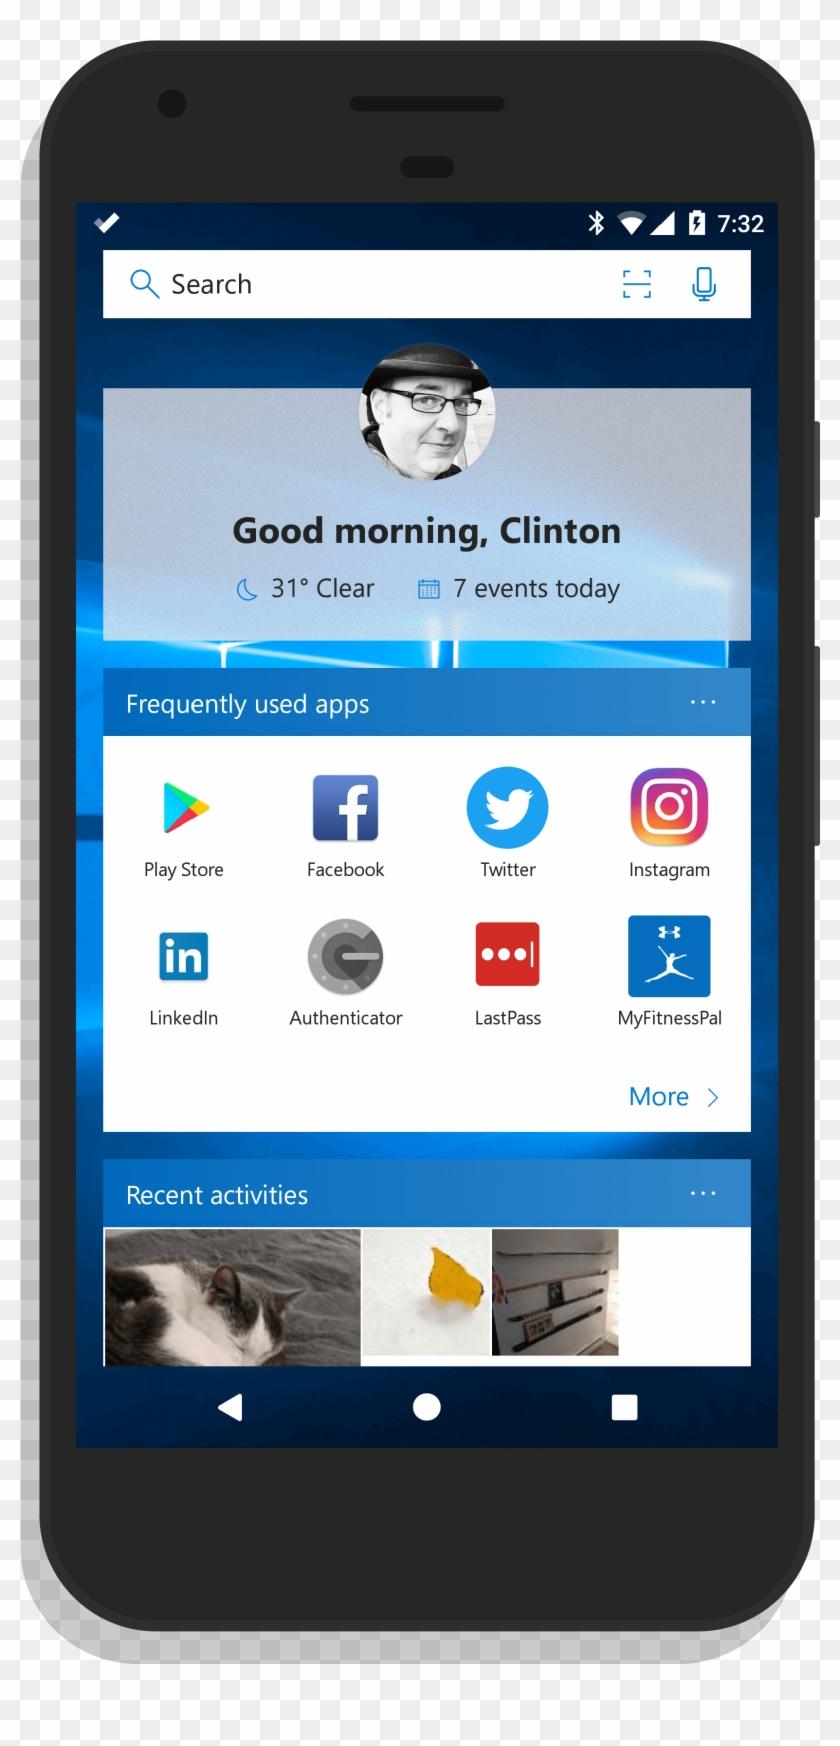 Transparent Launcher App - Facebook Like, HD Png Download